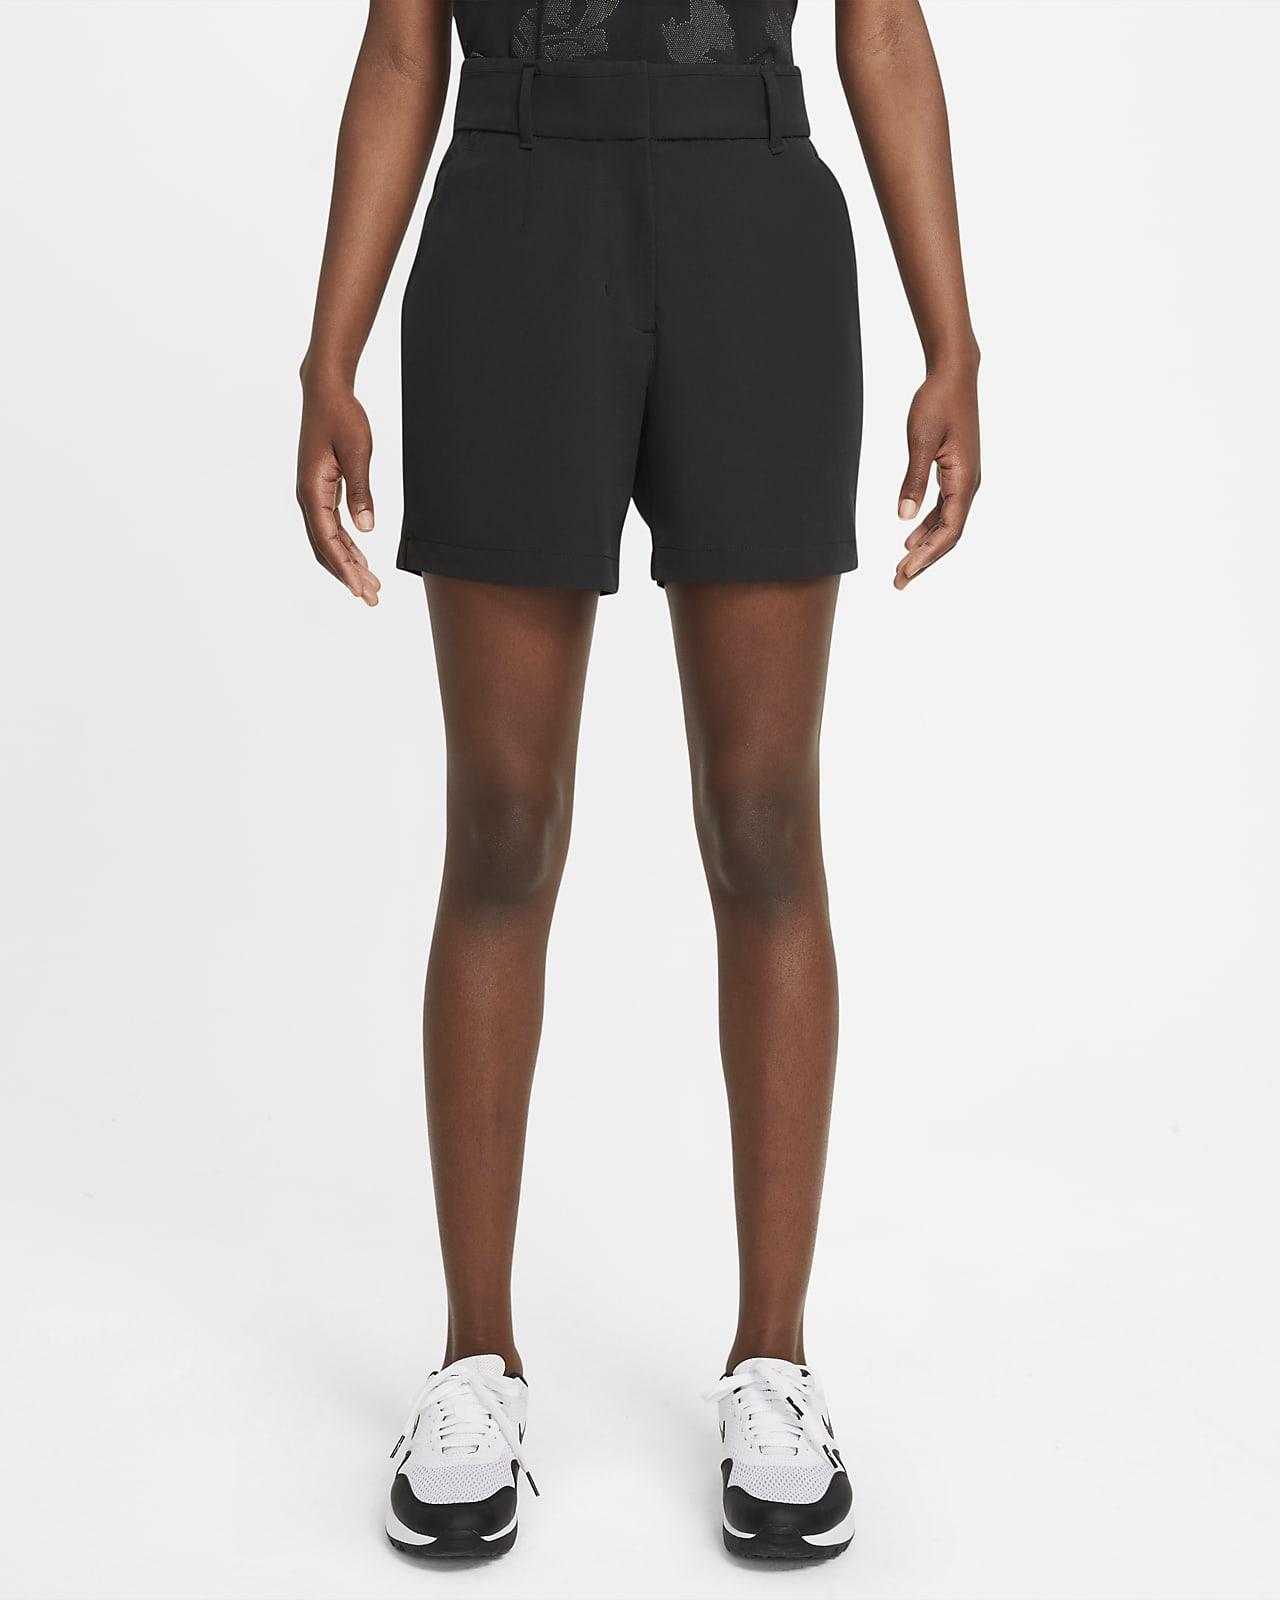 Nike Dri-FIT Victory 13 cm-es női golfrövidnadrág